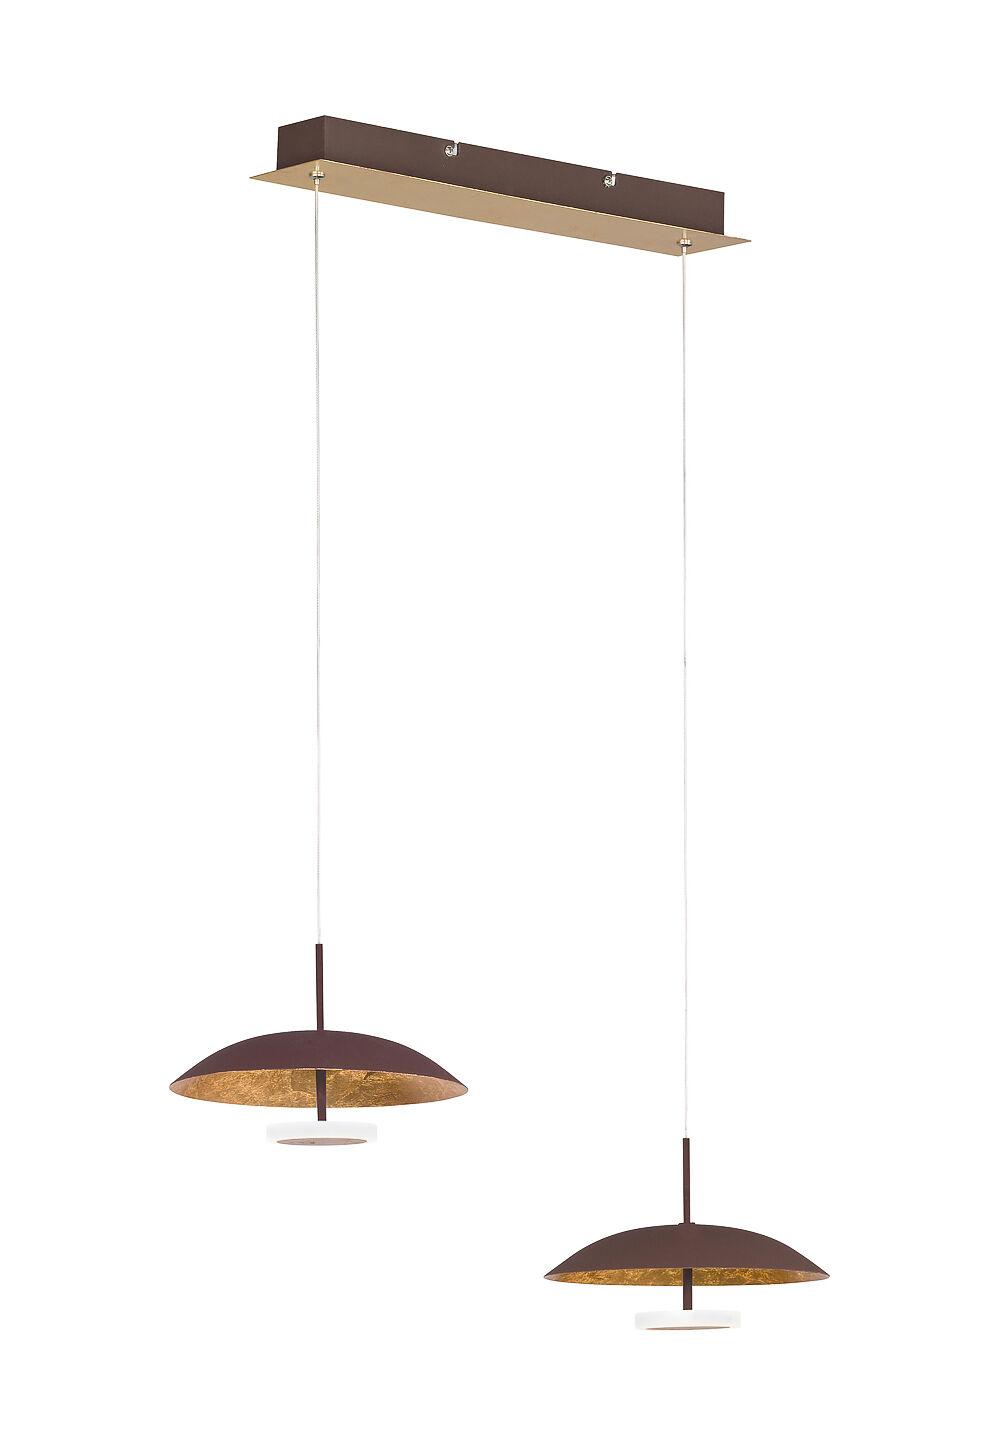 Wofi LED-Pendelleuchte Pierre, B61 x H150 x T21,5 cm